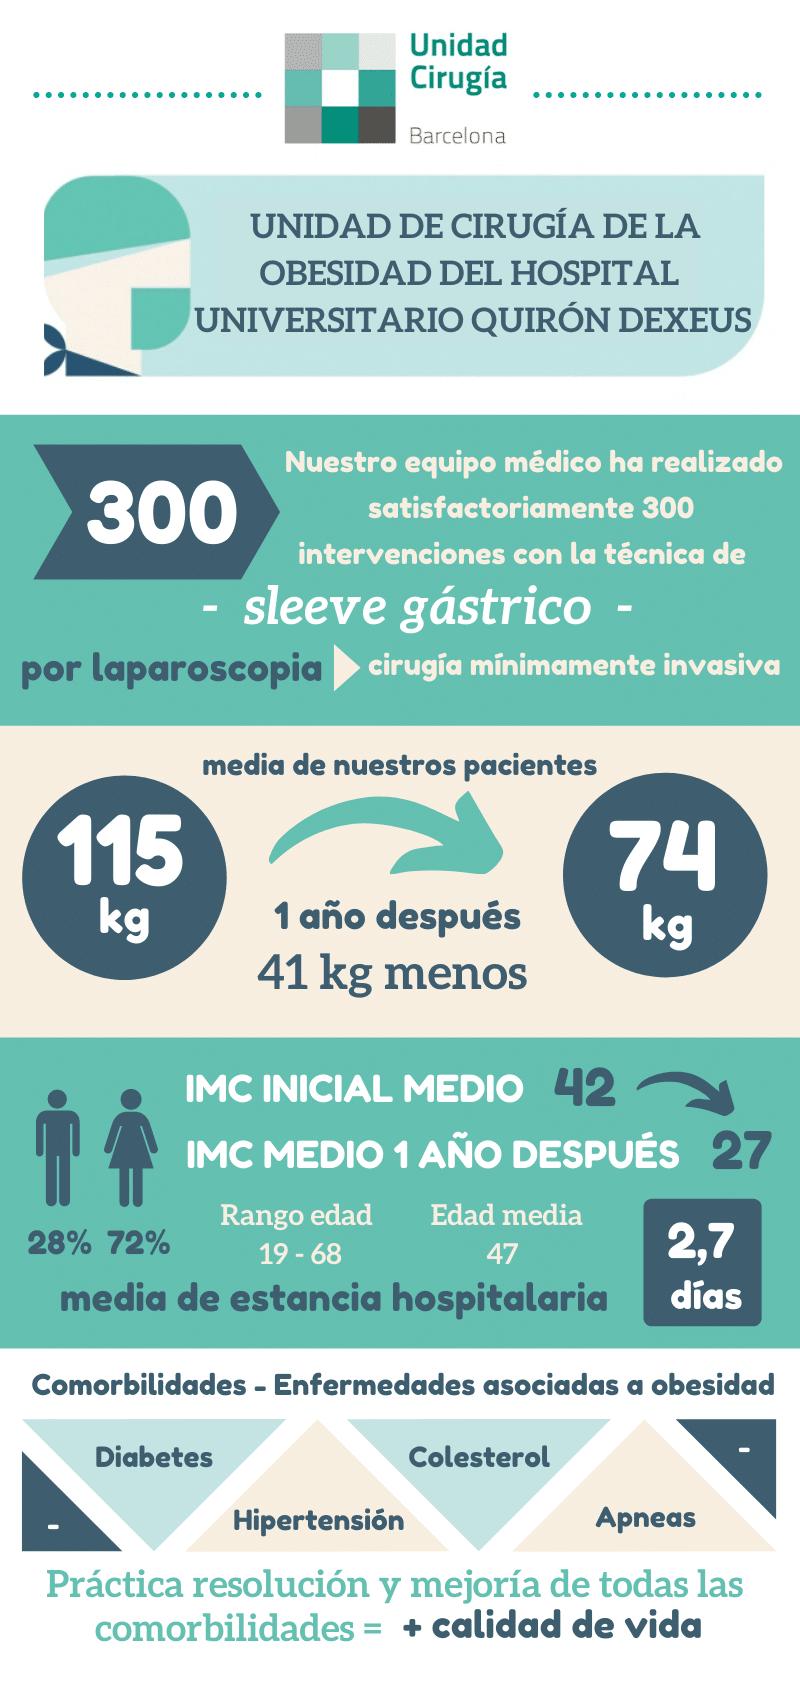 infografía-300-sleeves-gastricos